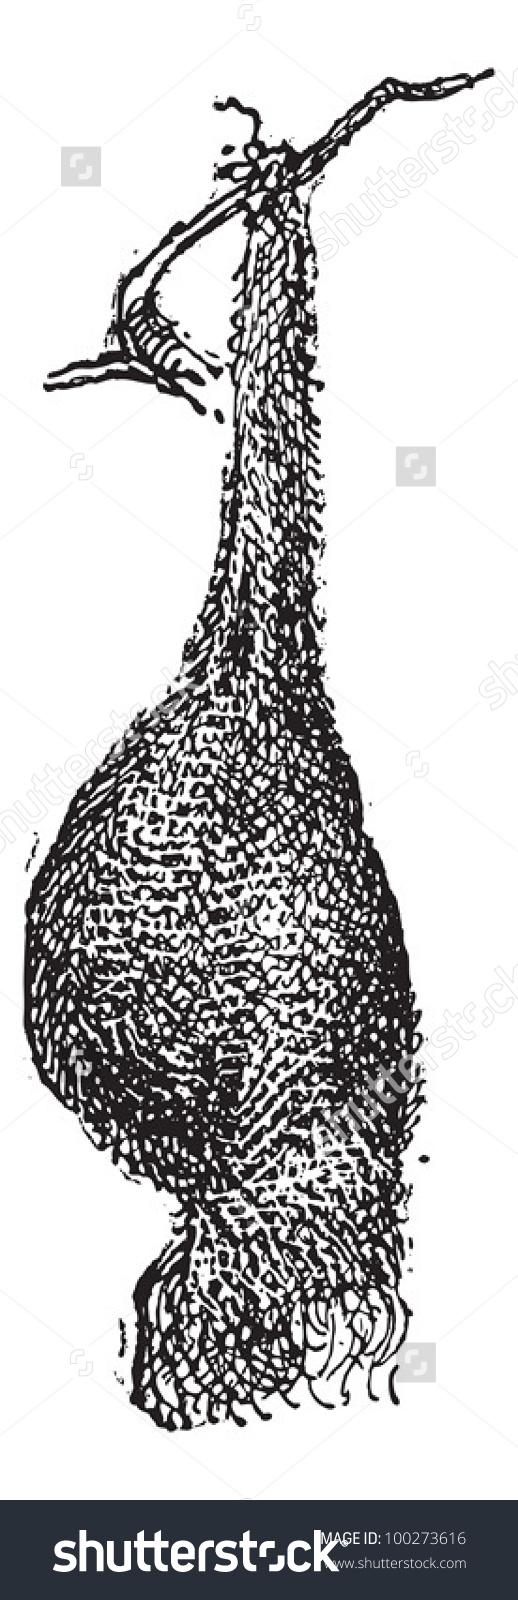 Weaver bird clipart - Clipground